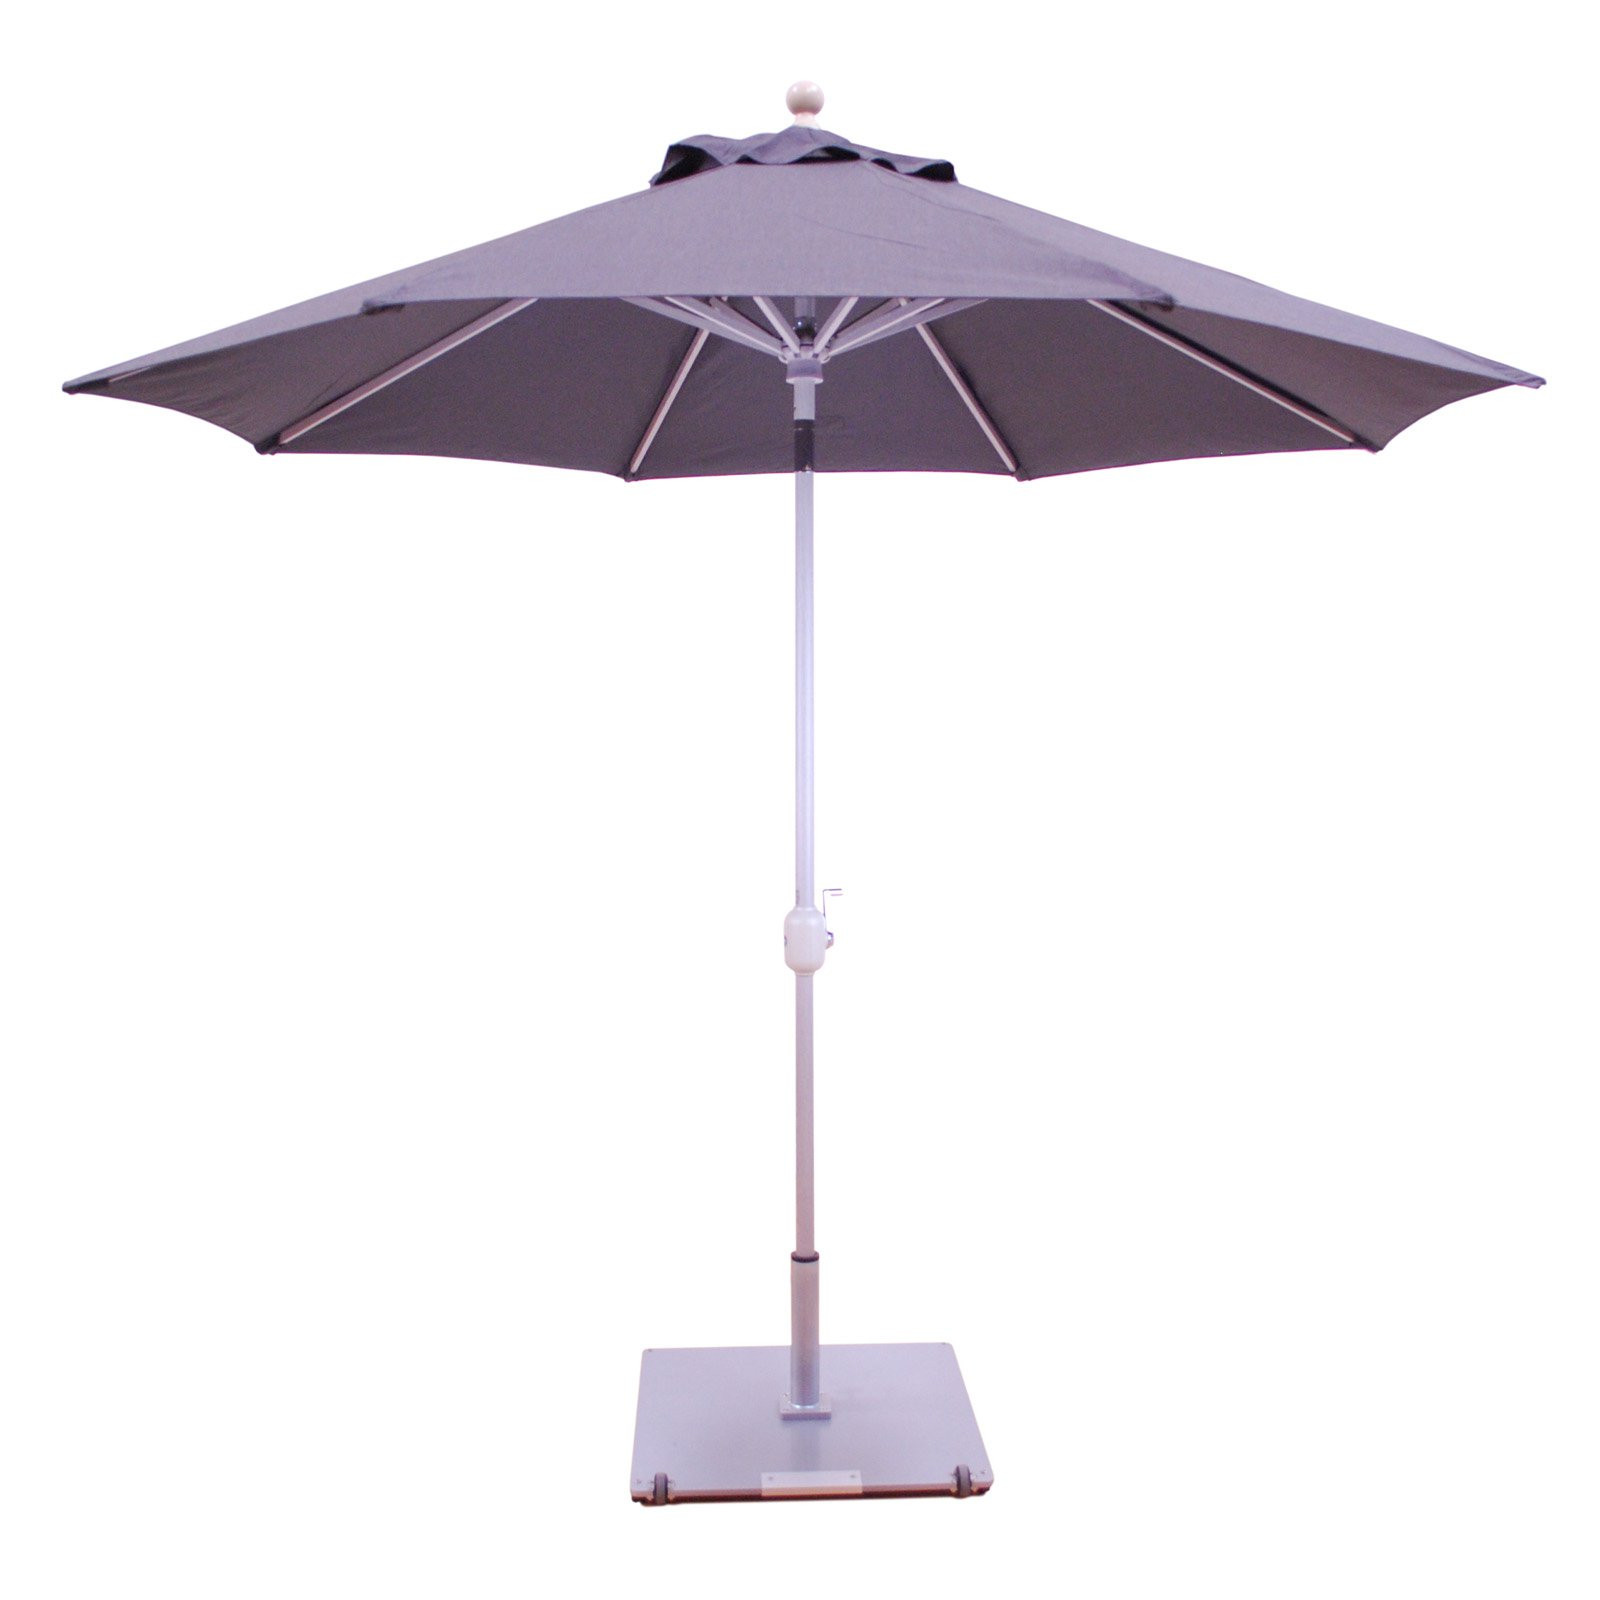 Best ideas about Sunbrella Patio Umbrellas . Save or Pin Galtech 9 ft Sunbrella Aluminum Patio Umbrella with Auto Now.